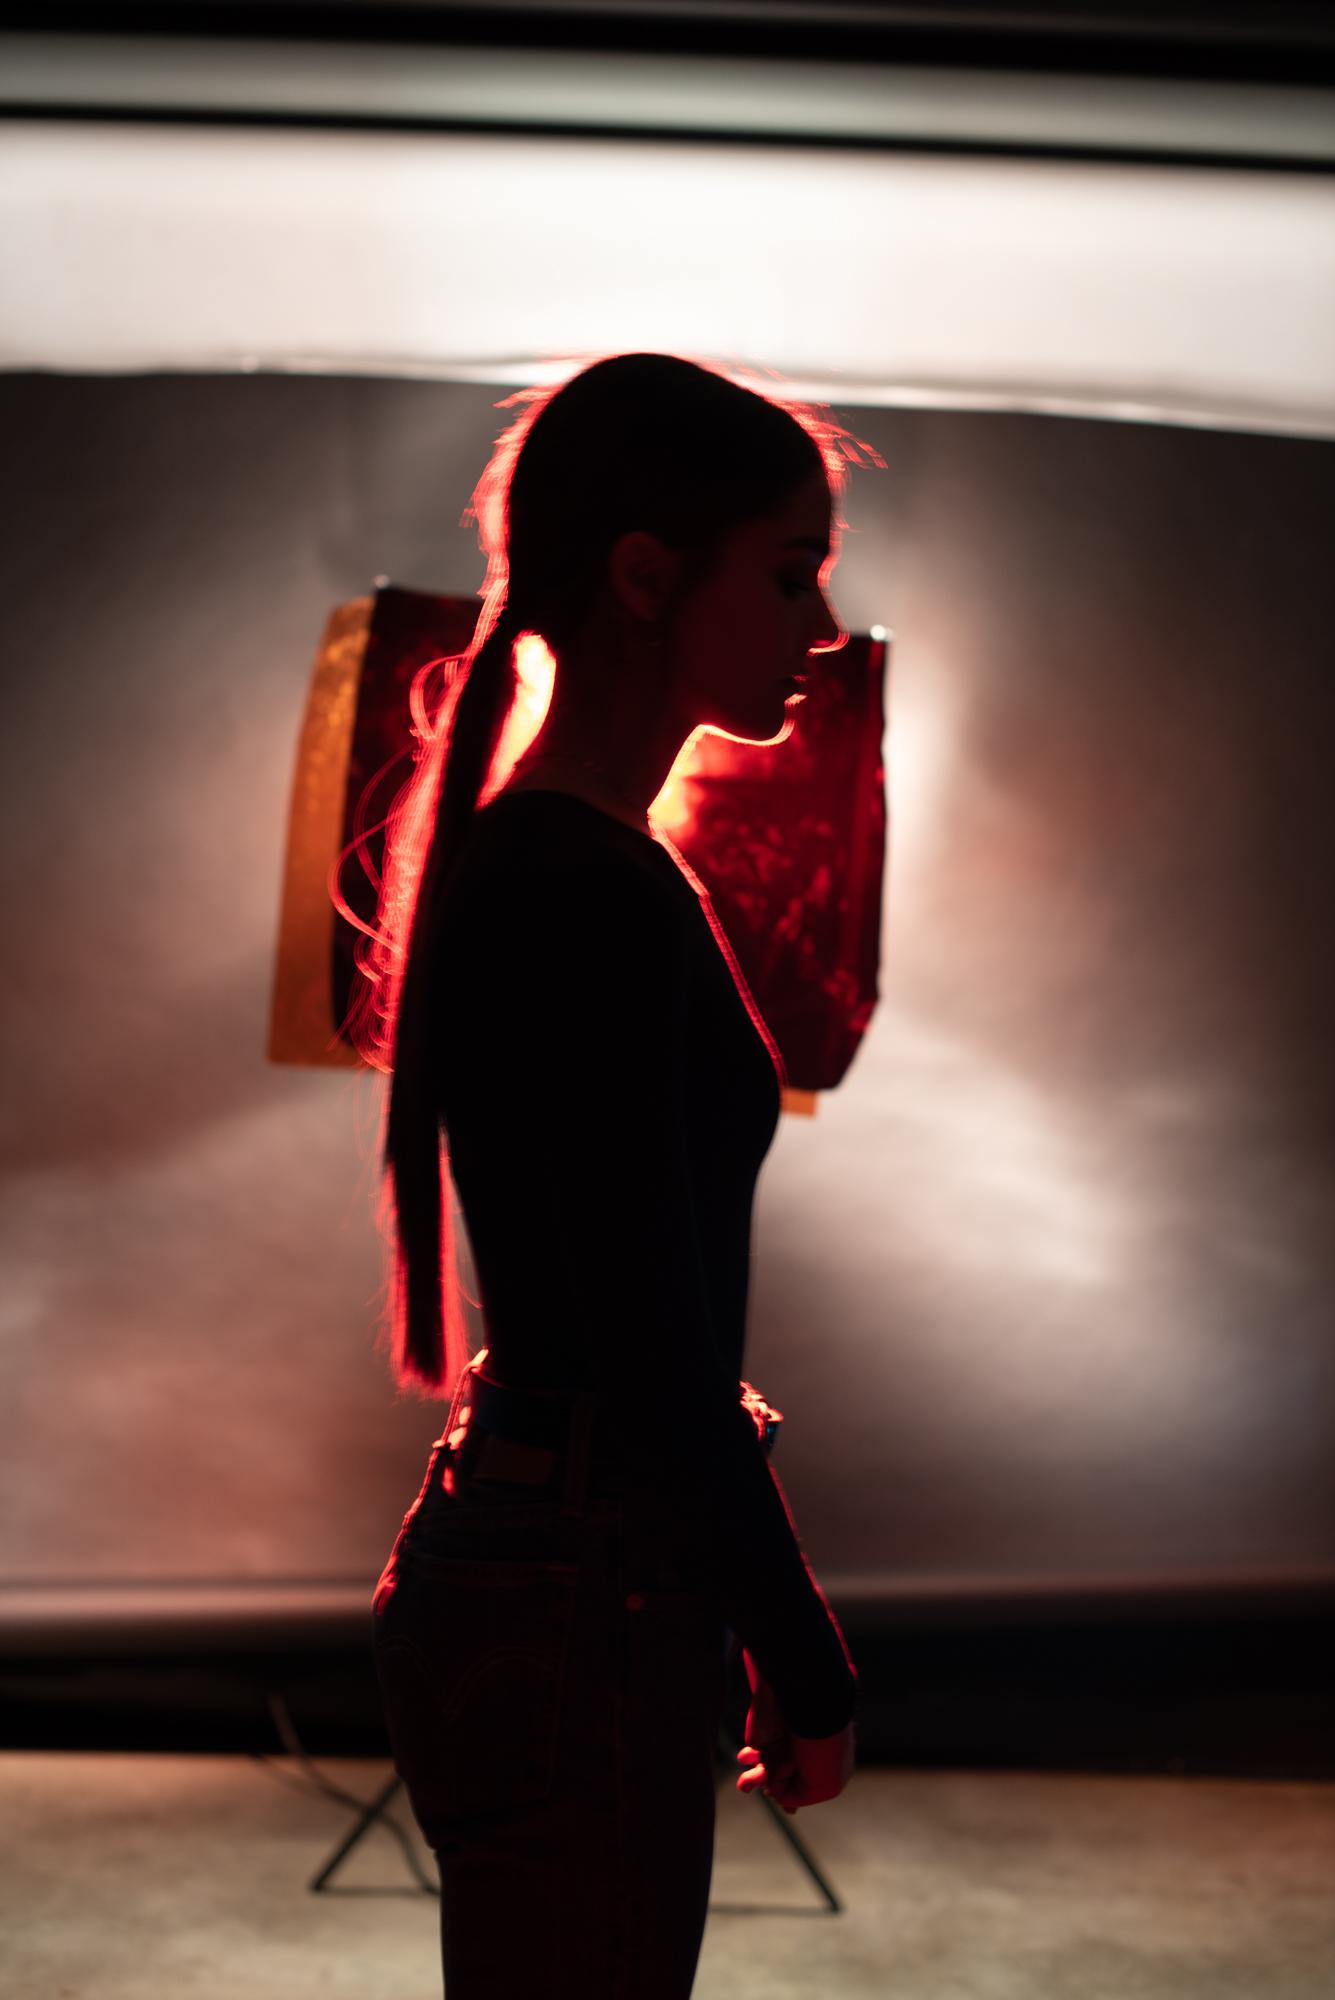 red light portraits-003.jpg